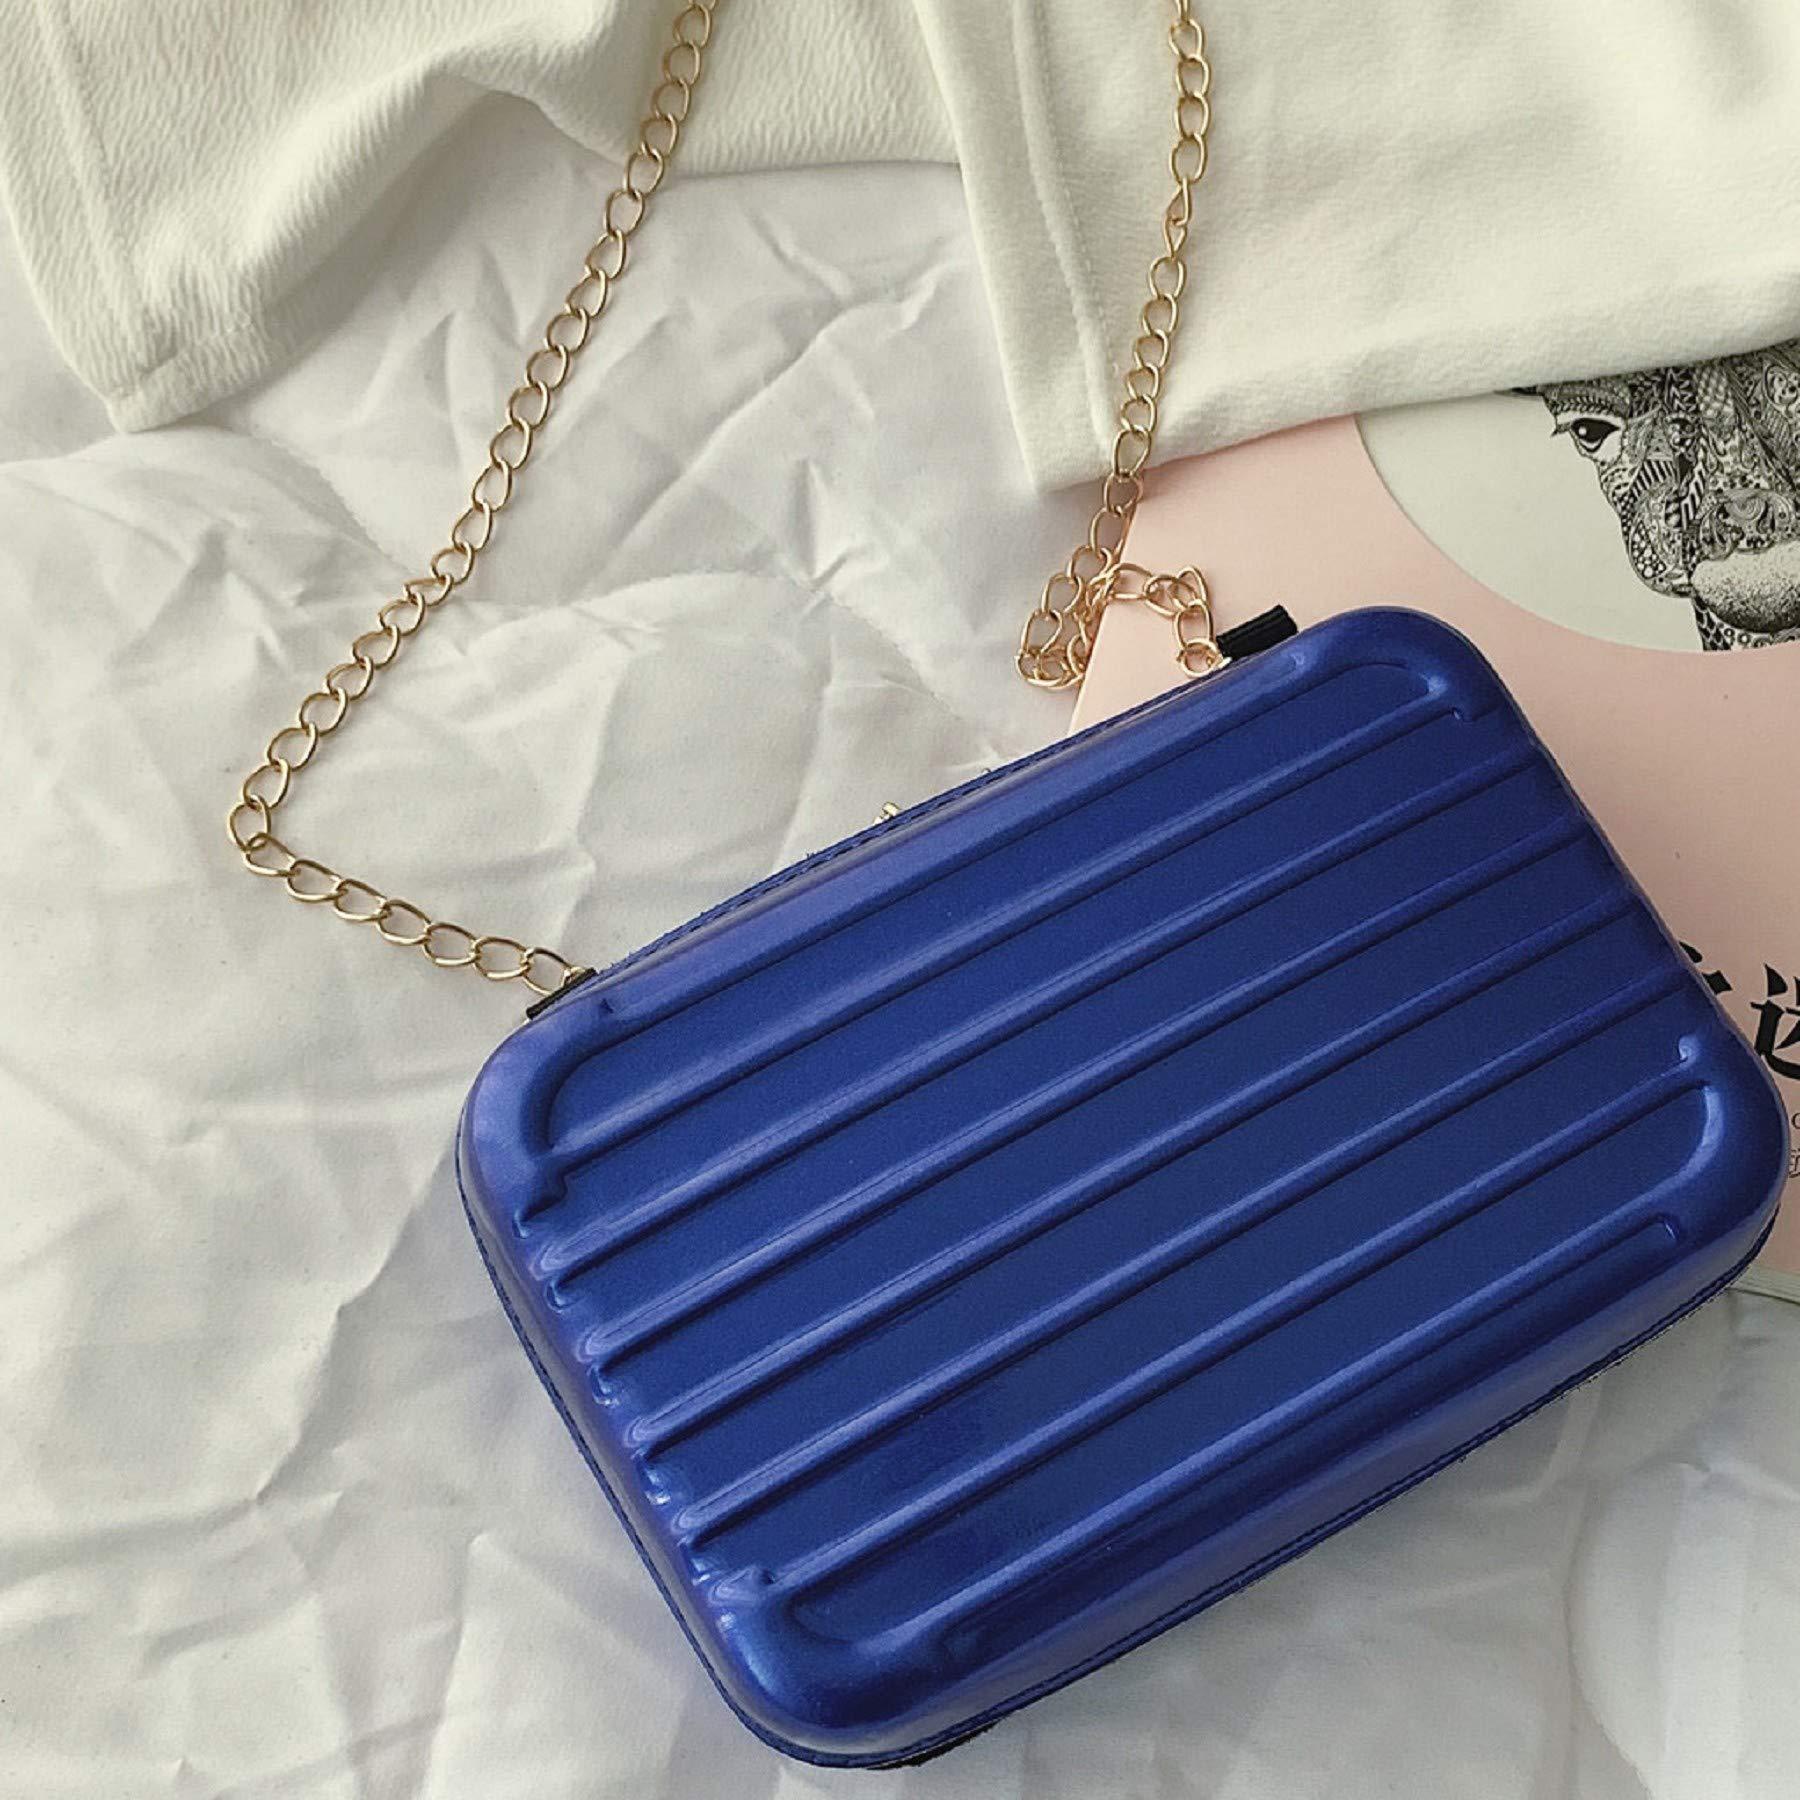 Women Square Bags Leisure Mini Chain Suitcase single-shoulder Bag Messenger Bags by Leedford (Image #2)